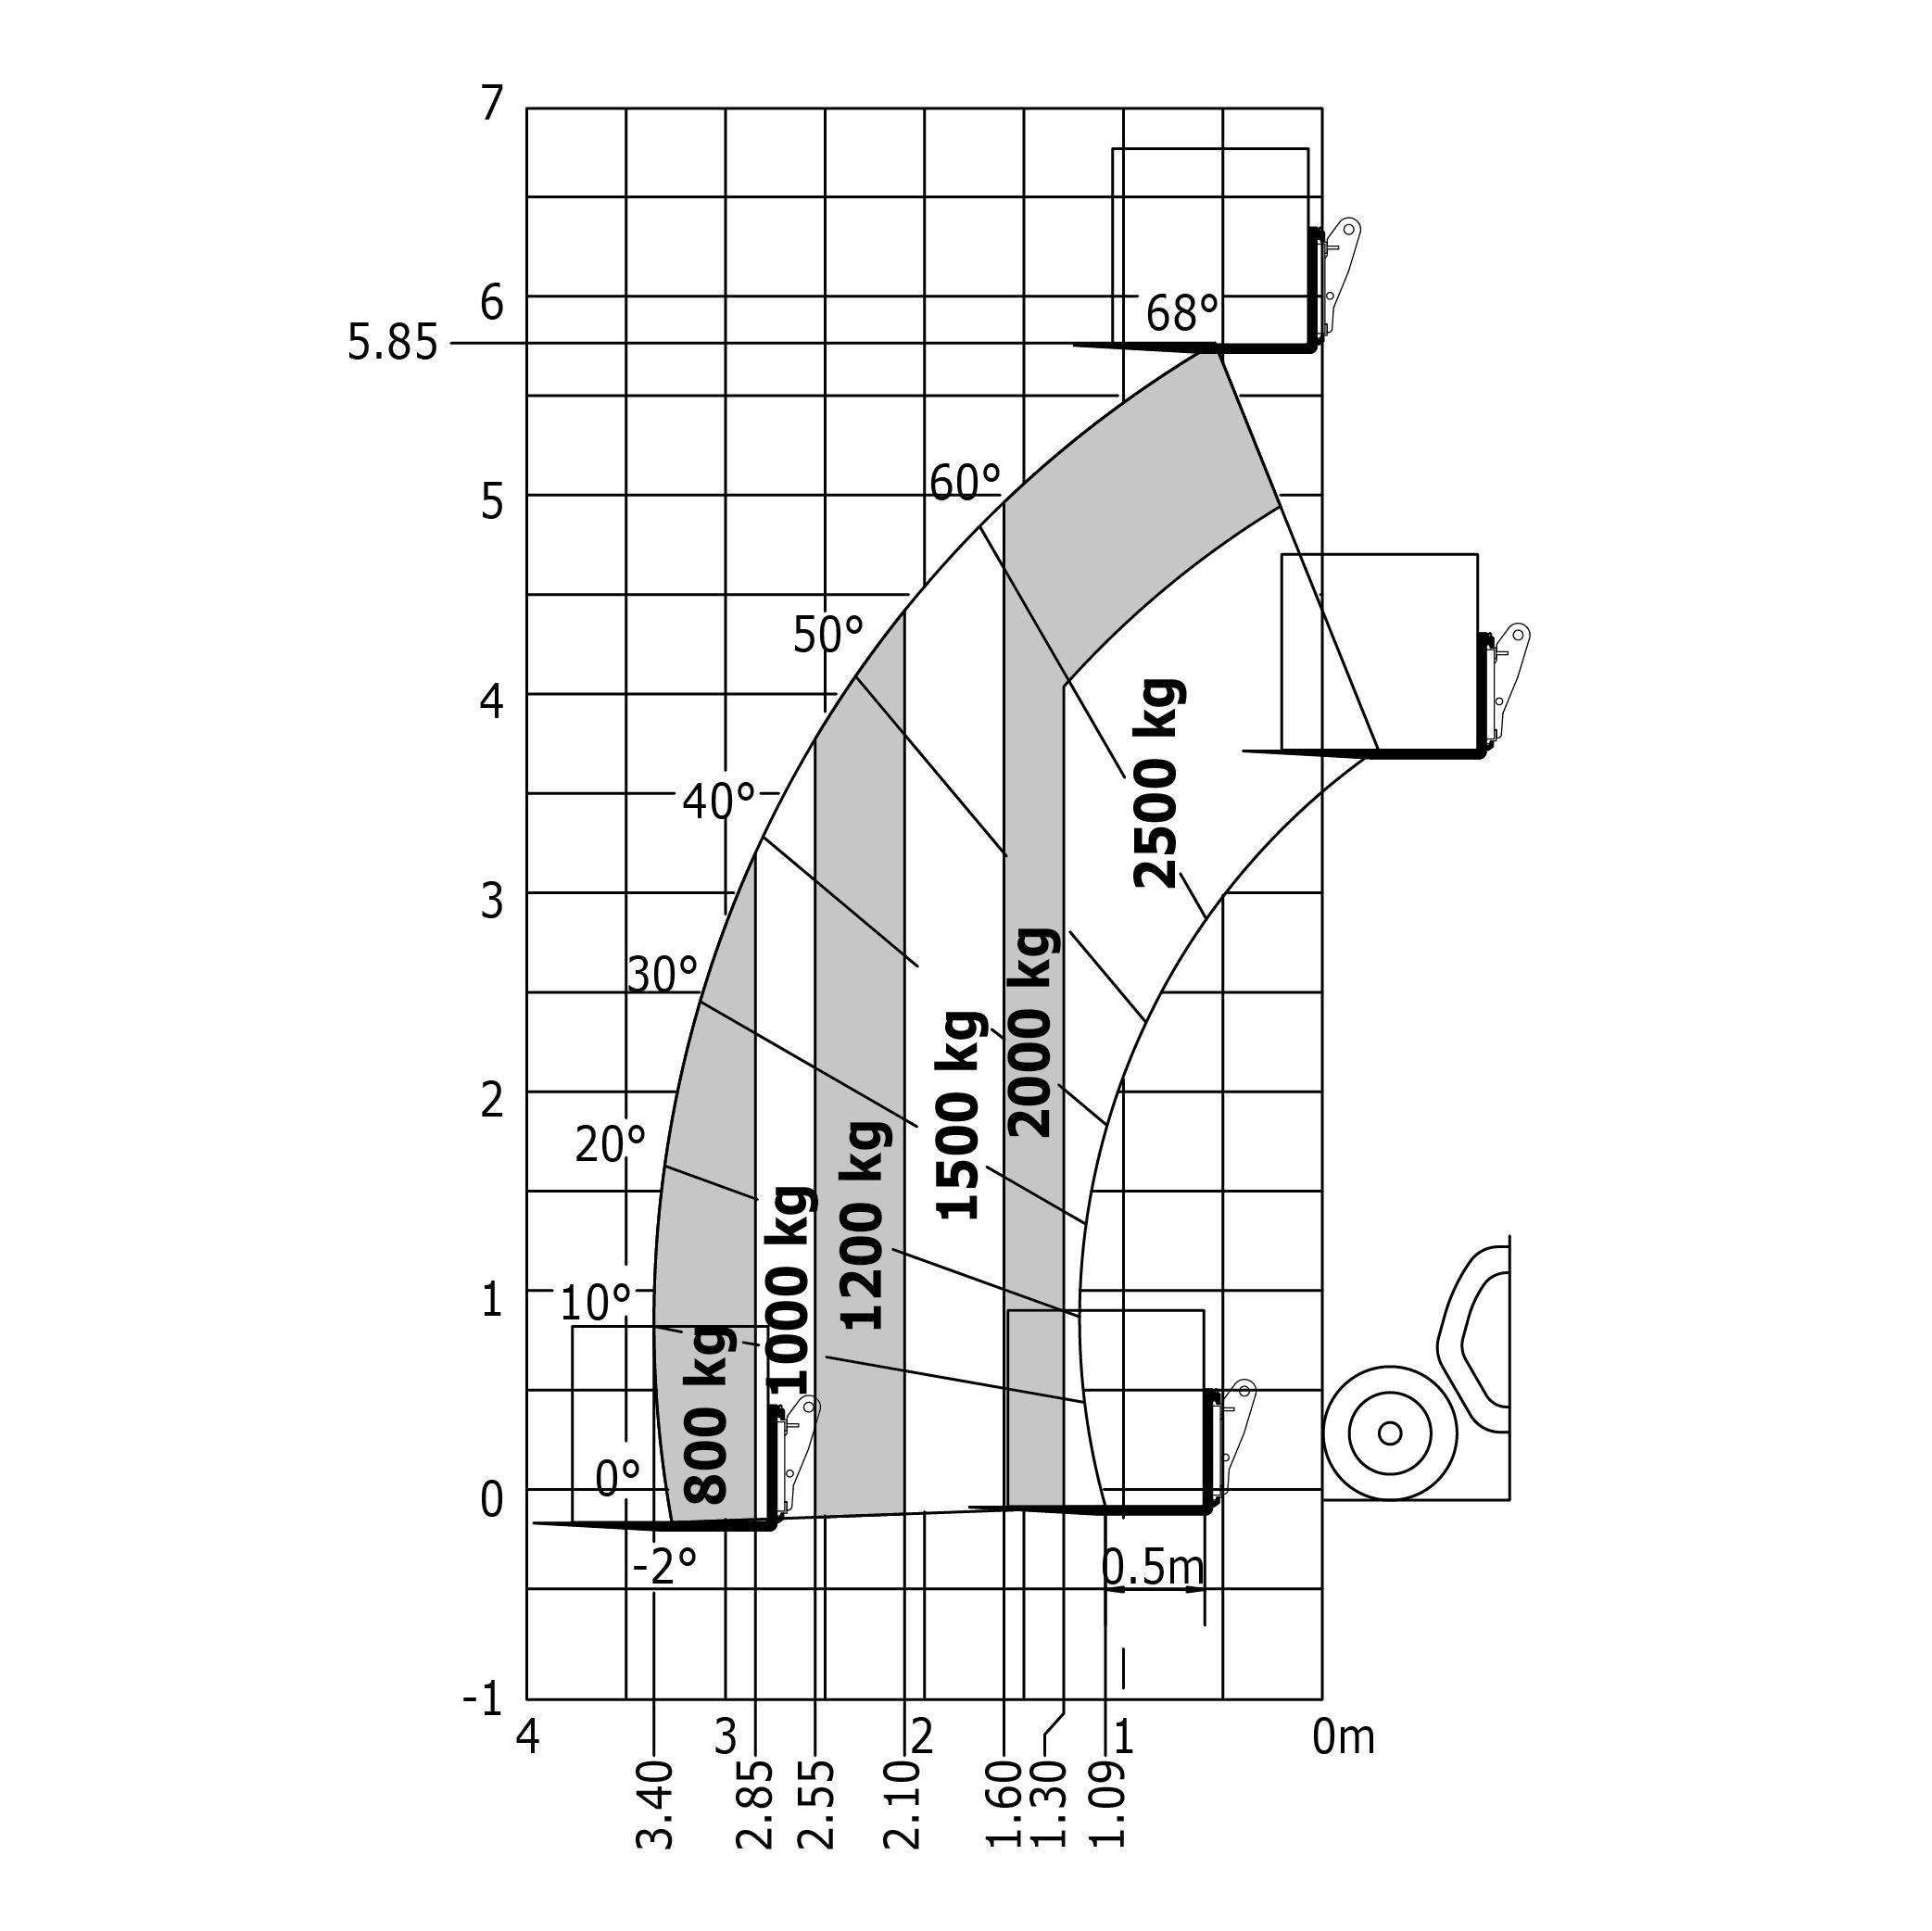 Snap Neutrik Nl4 Wiring Diagram 26 Images Powercon Speakon Rj 45 Elsalvadorla